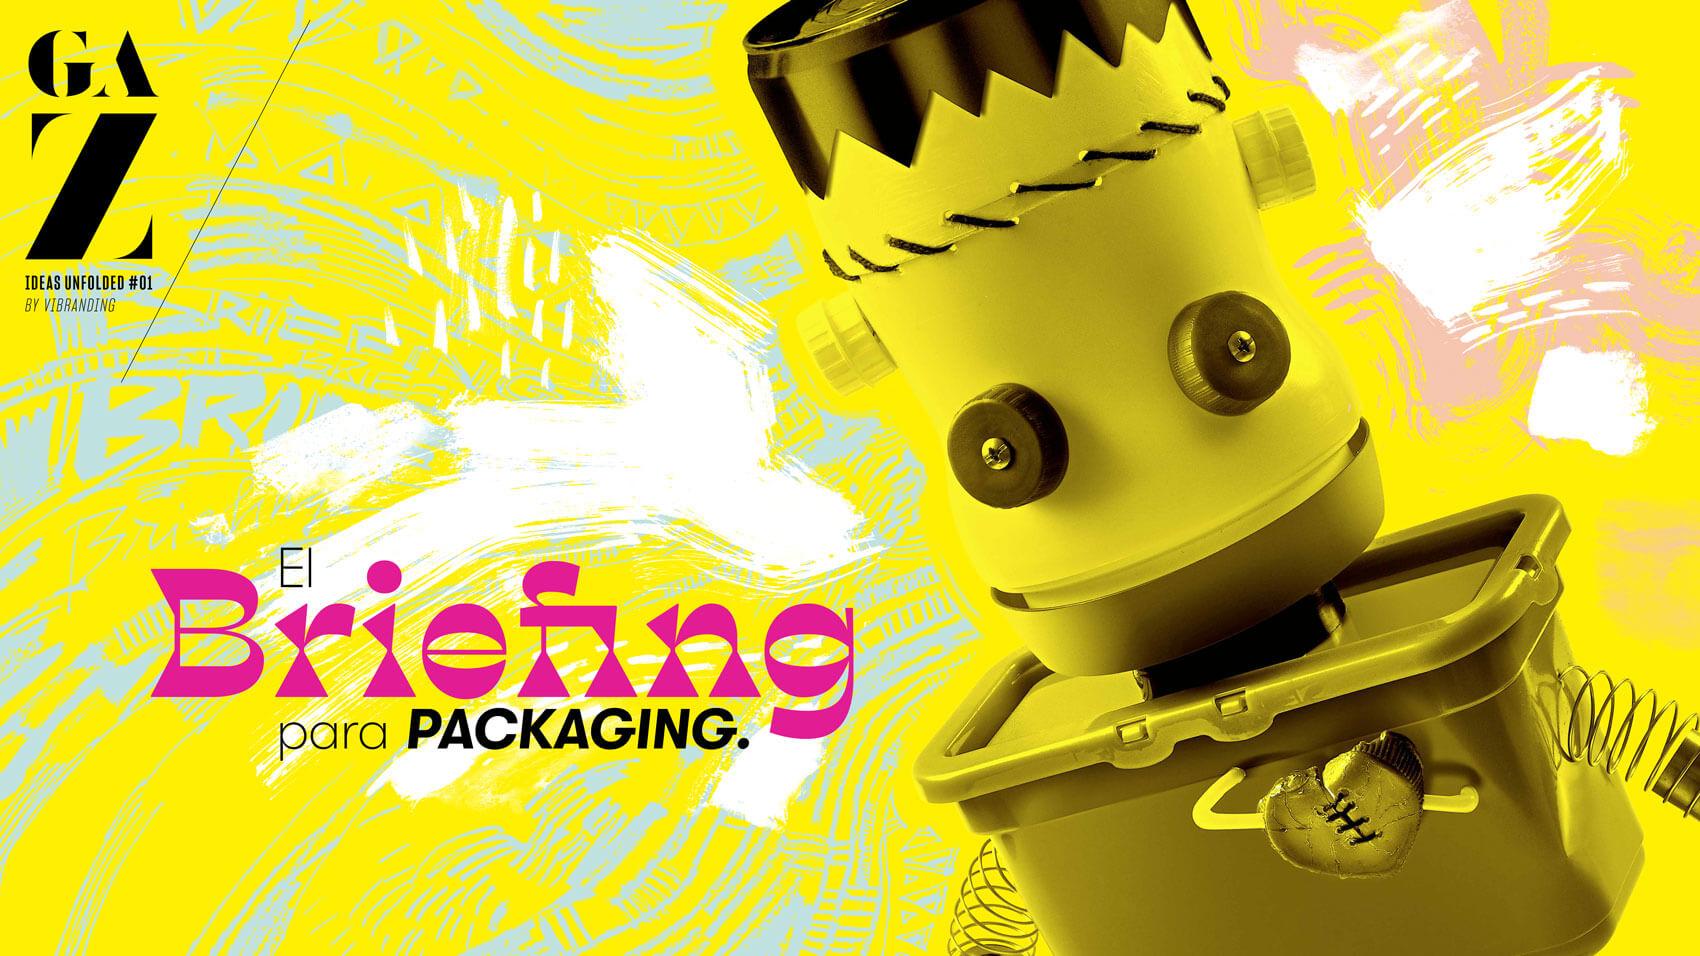 GA-Z ideas unfolded packaging briefing branding diseño gráfico editorial ezine marketing Vibranding